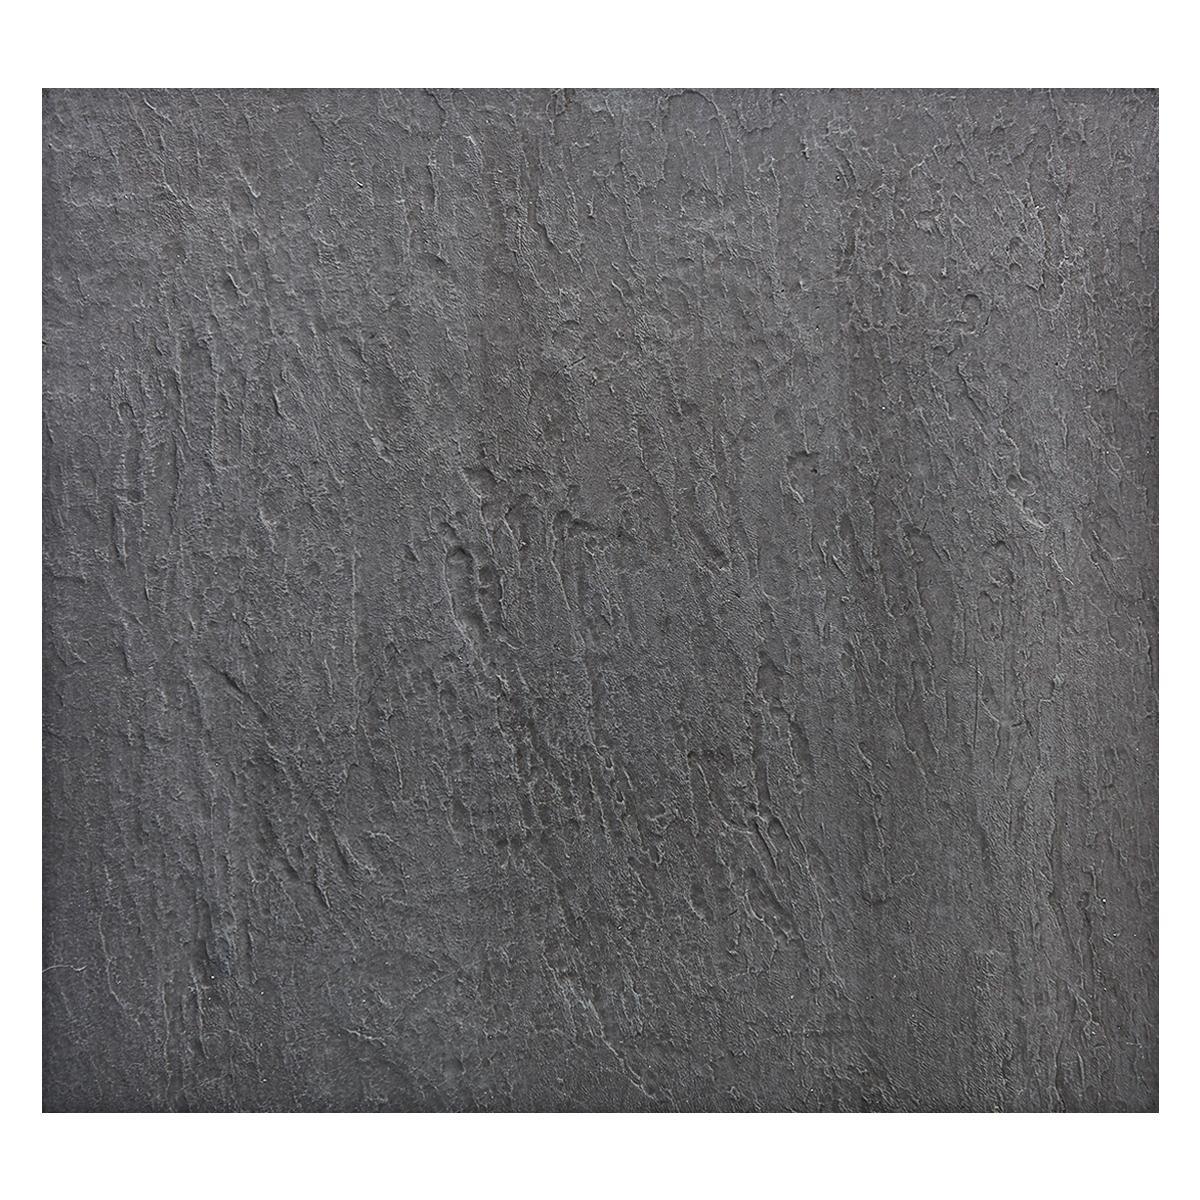 Piso Laja Fina Gris Oscuro Mate - 40X40 cm - 0.32 m2